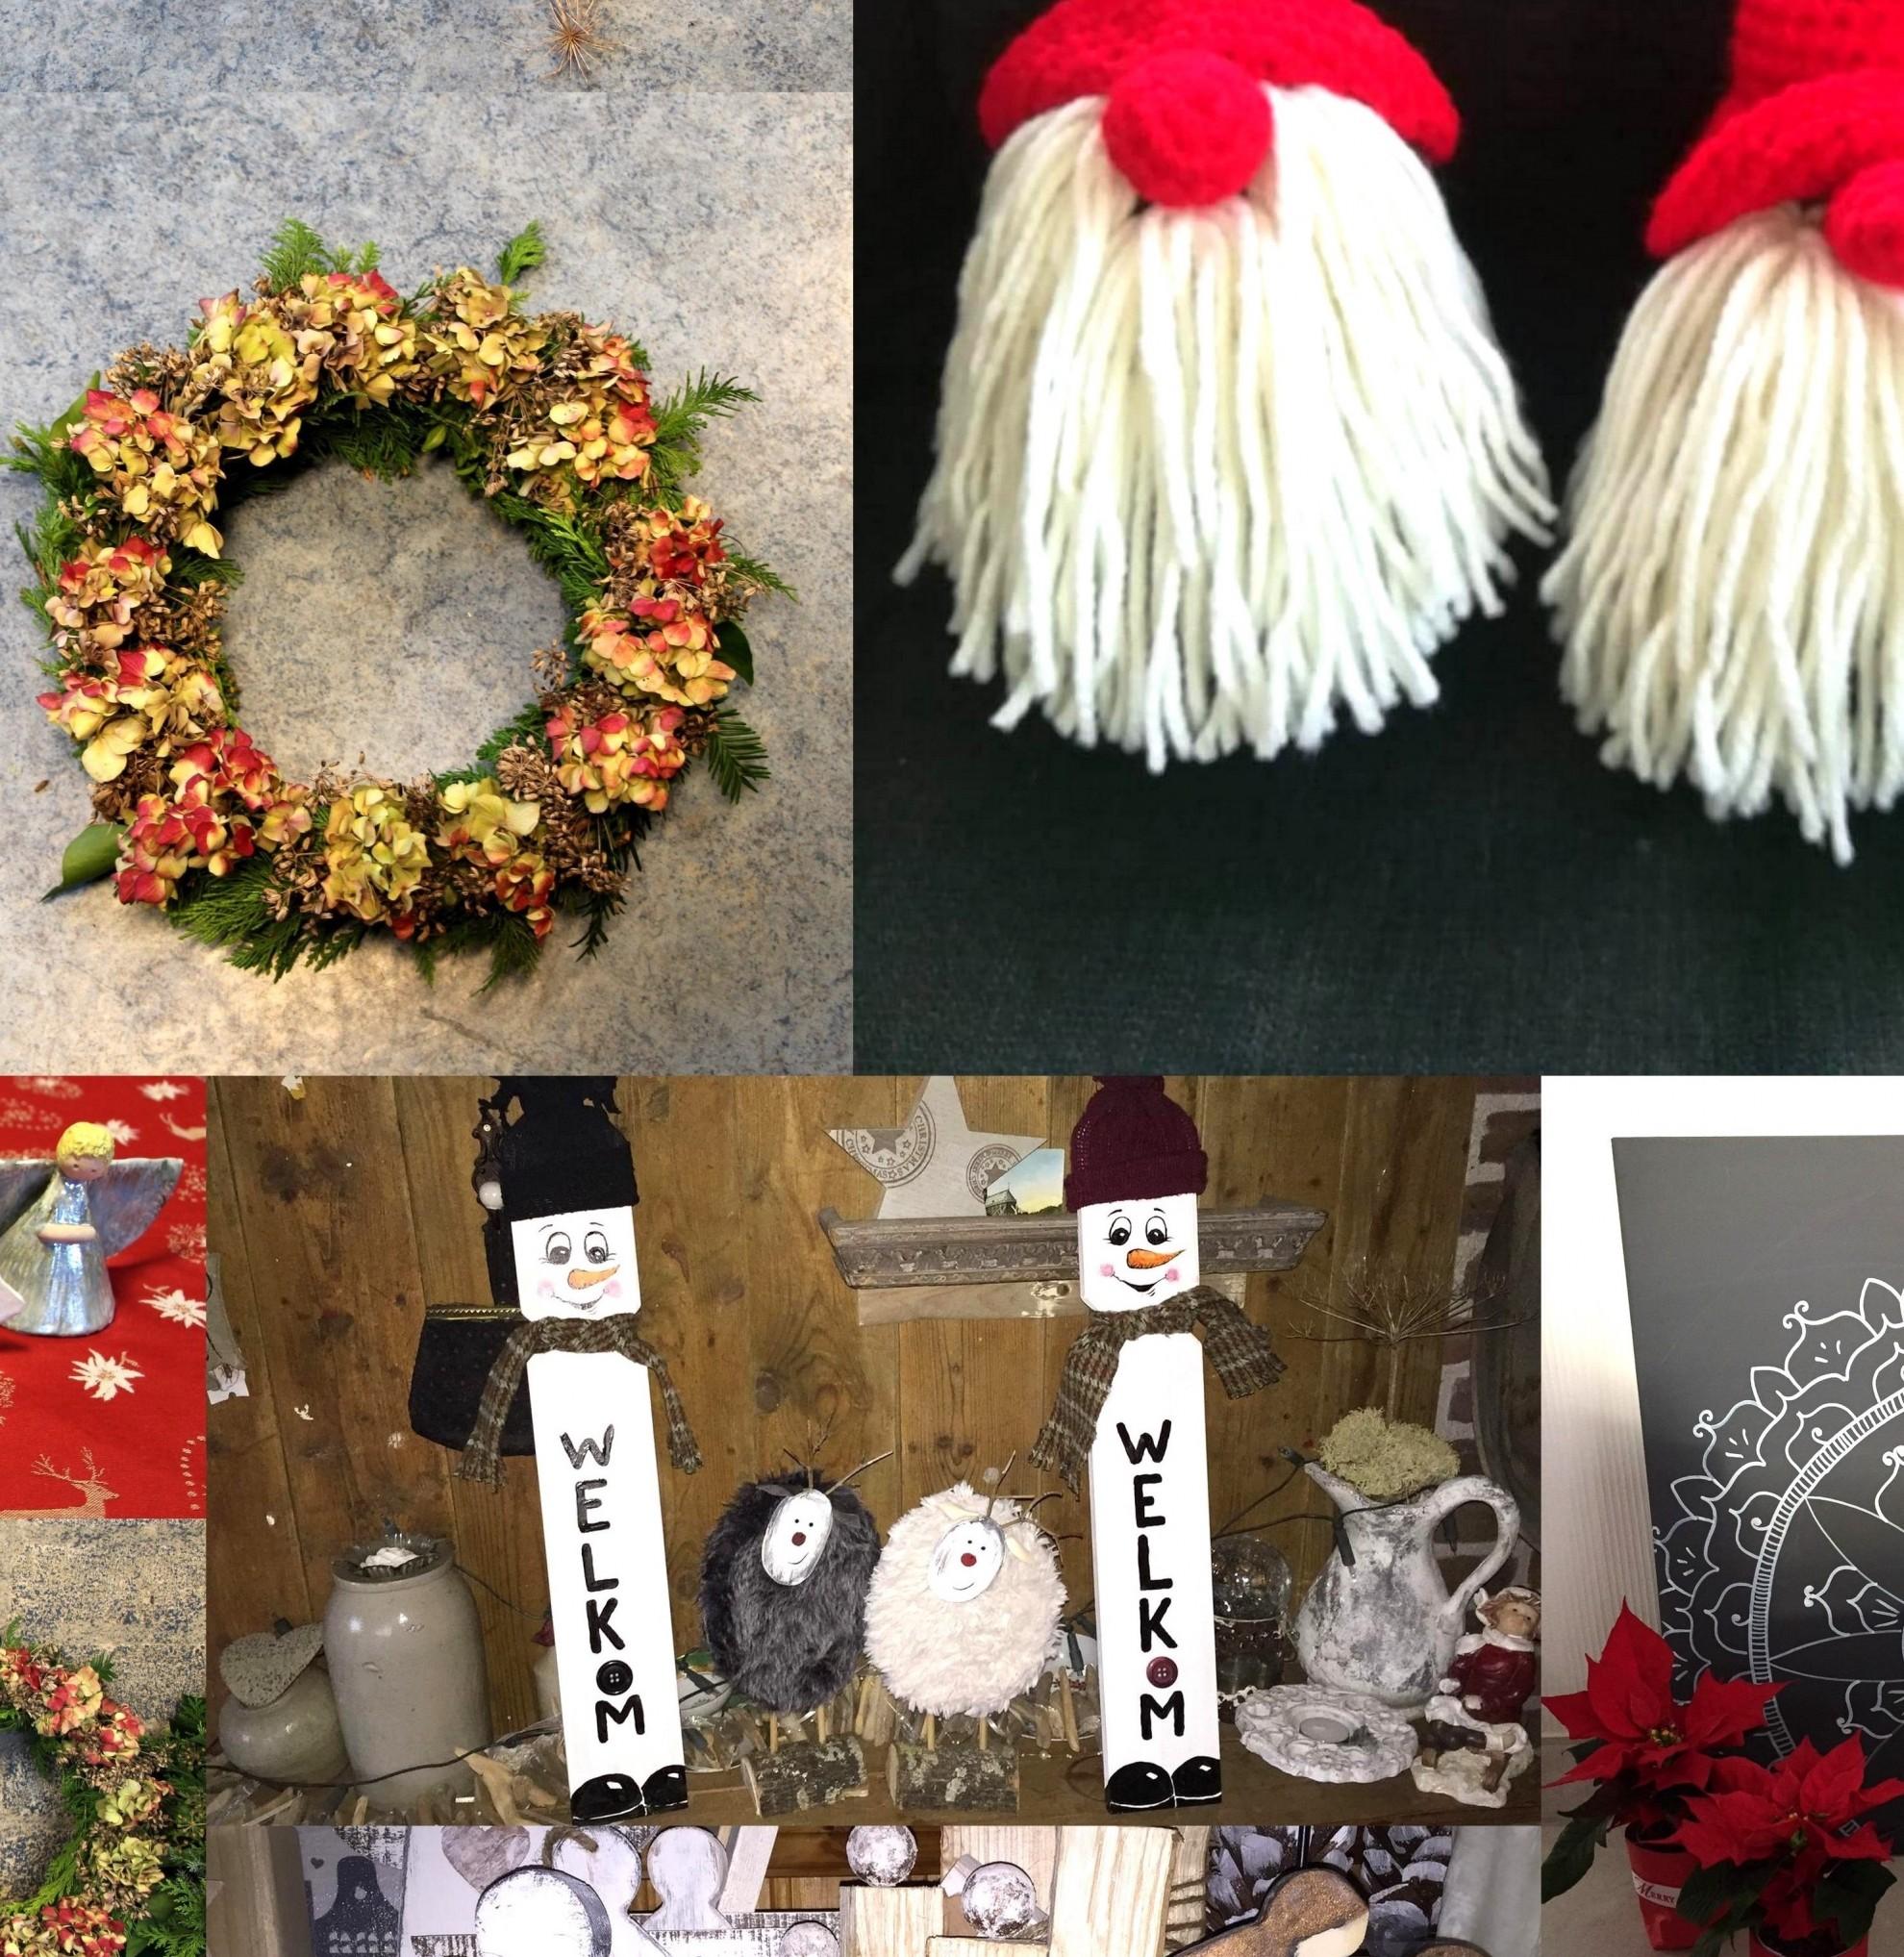 Kerstontmoetingsfair - maken kransen en kerststukjes